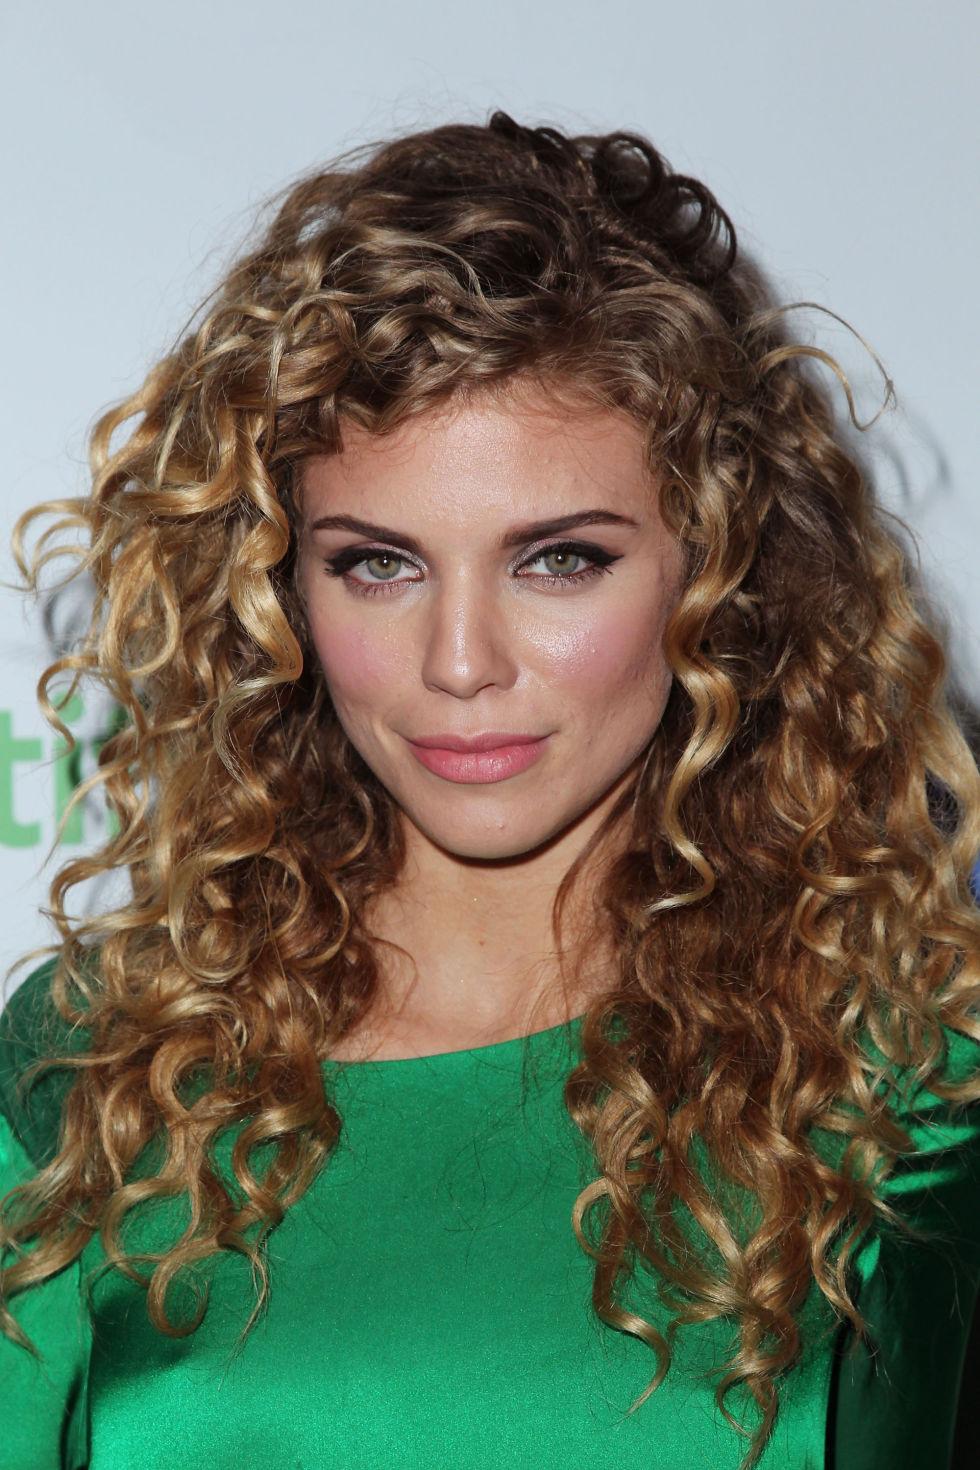 Enjoyable 30 Best Curly Hairstyles Of 2017 Cute Hairstyles For Curly Hair Short Hairstyles For Black Women Fulllsitofus